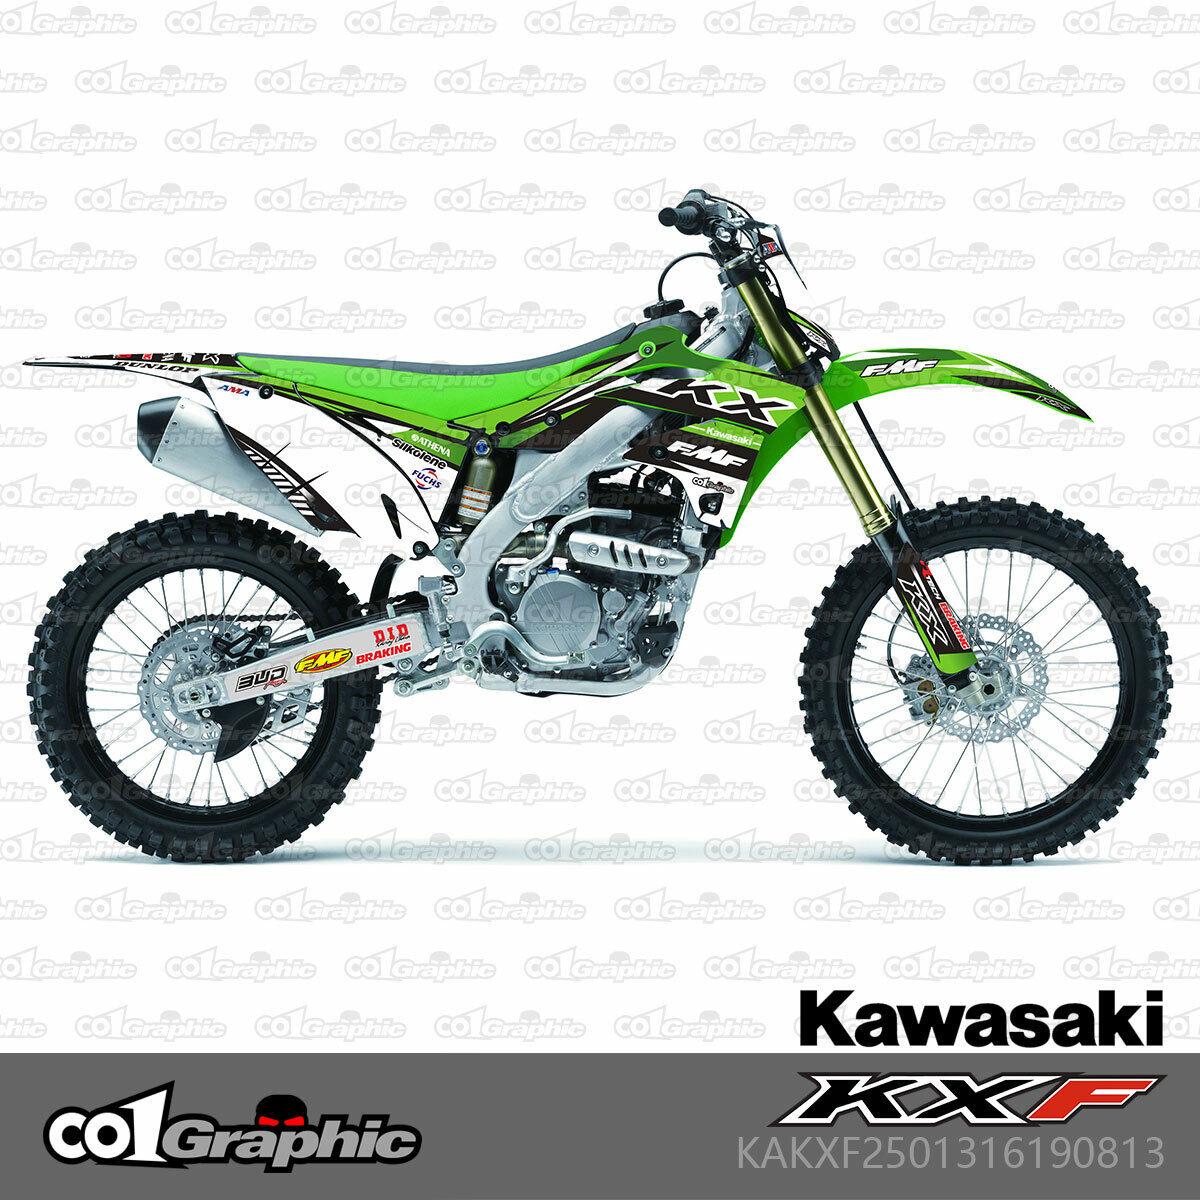 2013 2014 2015 2016 KXF 250 GRAPHICS KIT KAWASAKI GREEN ISLANDSTRIKE DECAL KIT